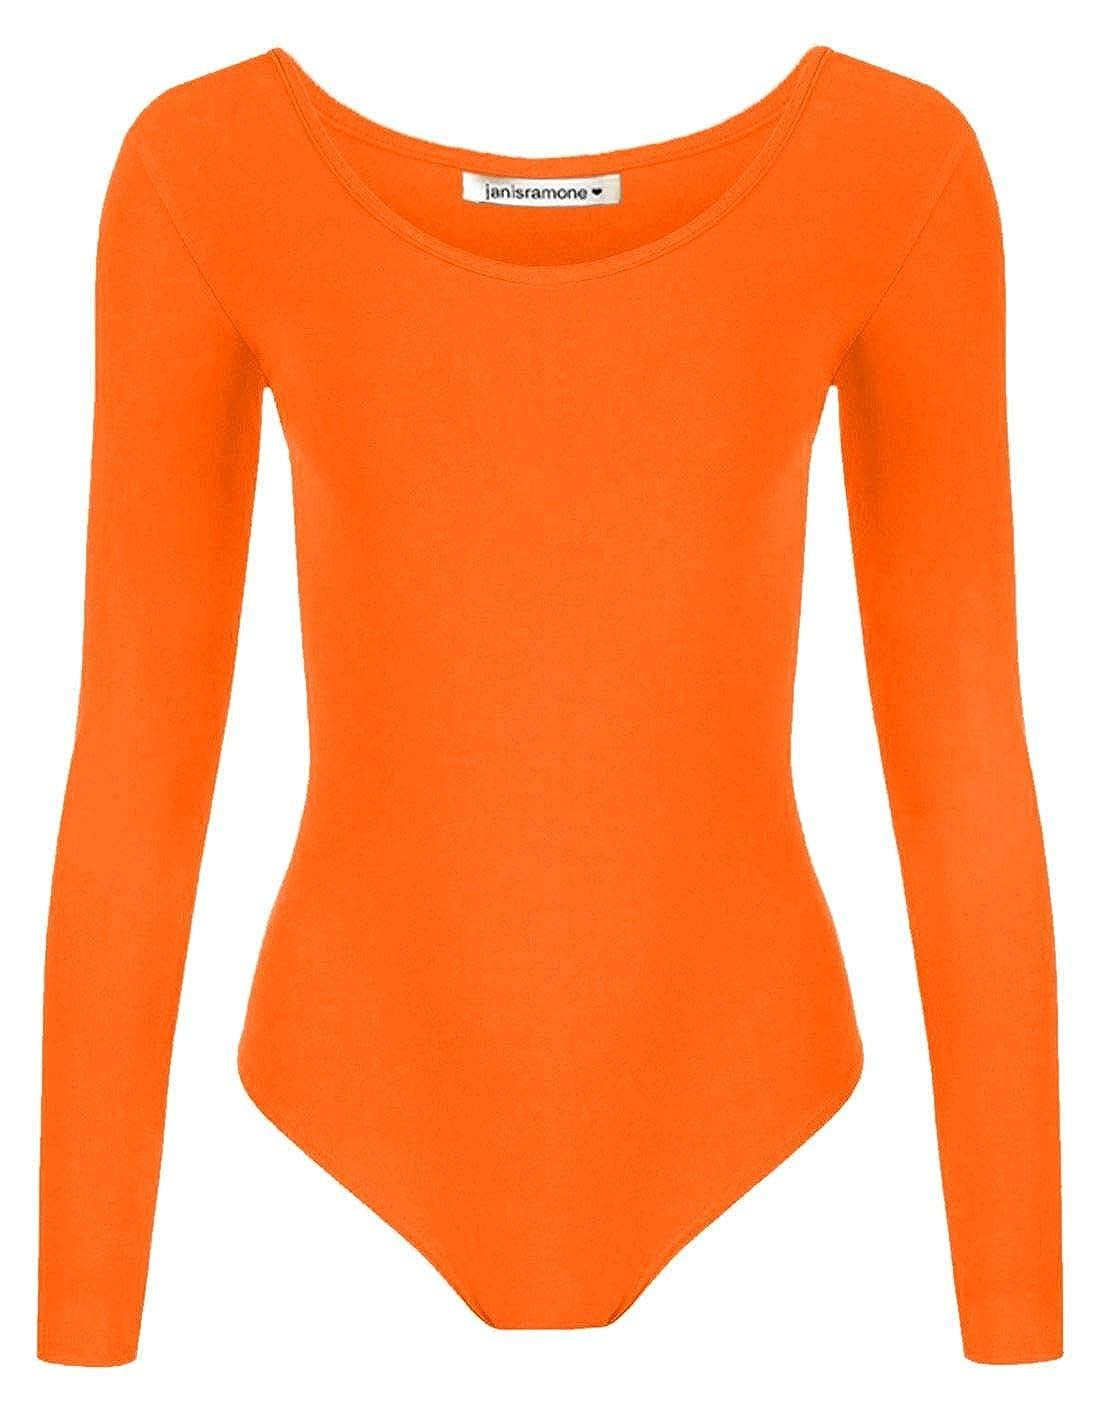 Janisramone New Girls Kids Plain Long Sleeve Microfibre Stretch Dance Leotard Bodysuit Top